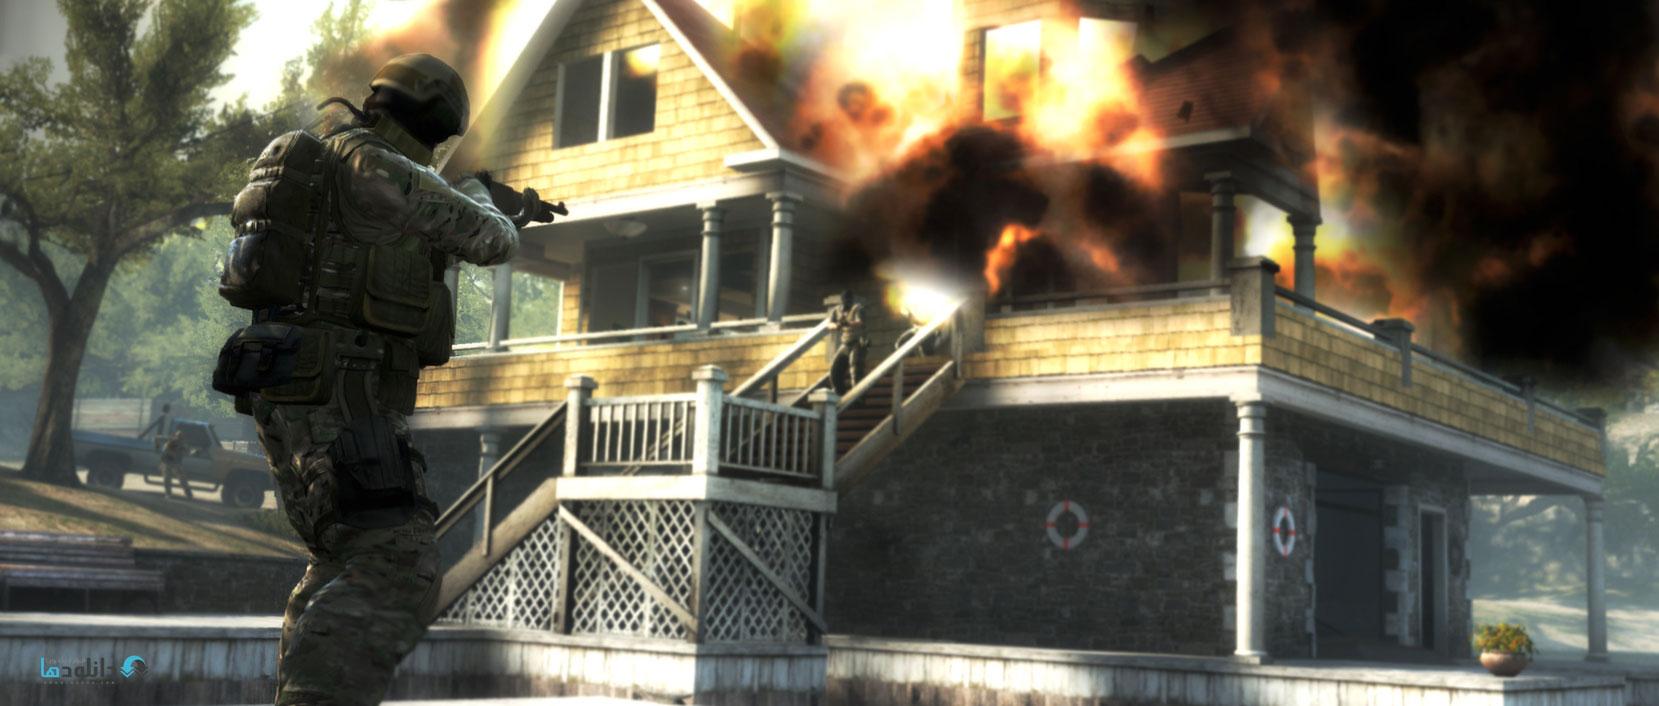 http://img5.downloadha.com/hosein/Game/February%202015/27/CS-GO-screenshots-02-large.jpg